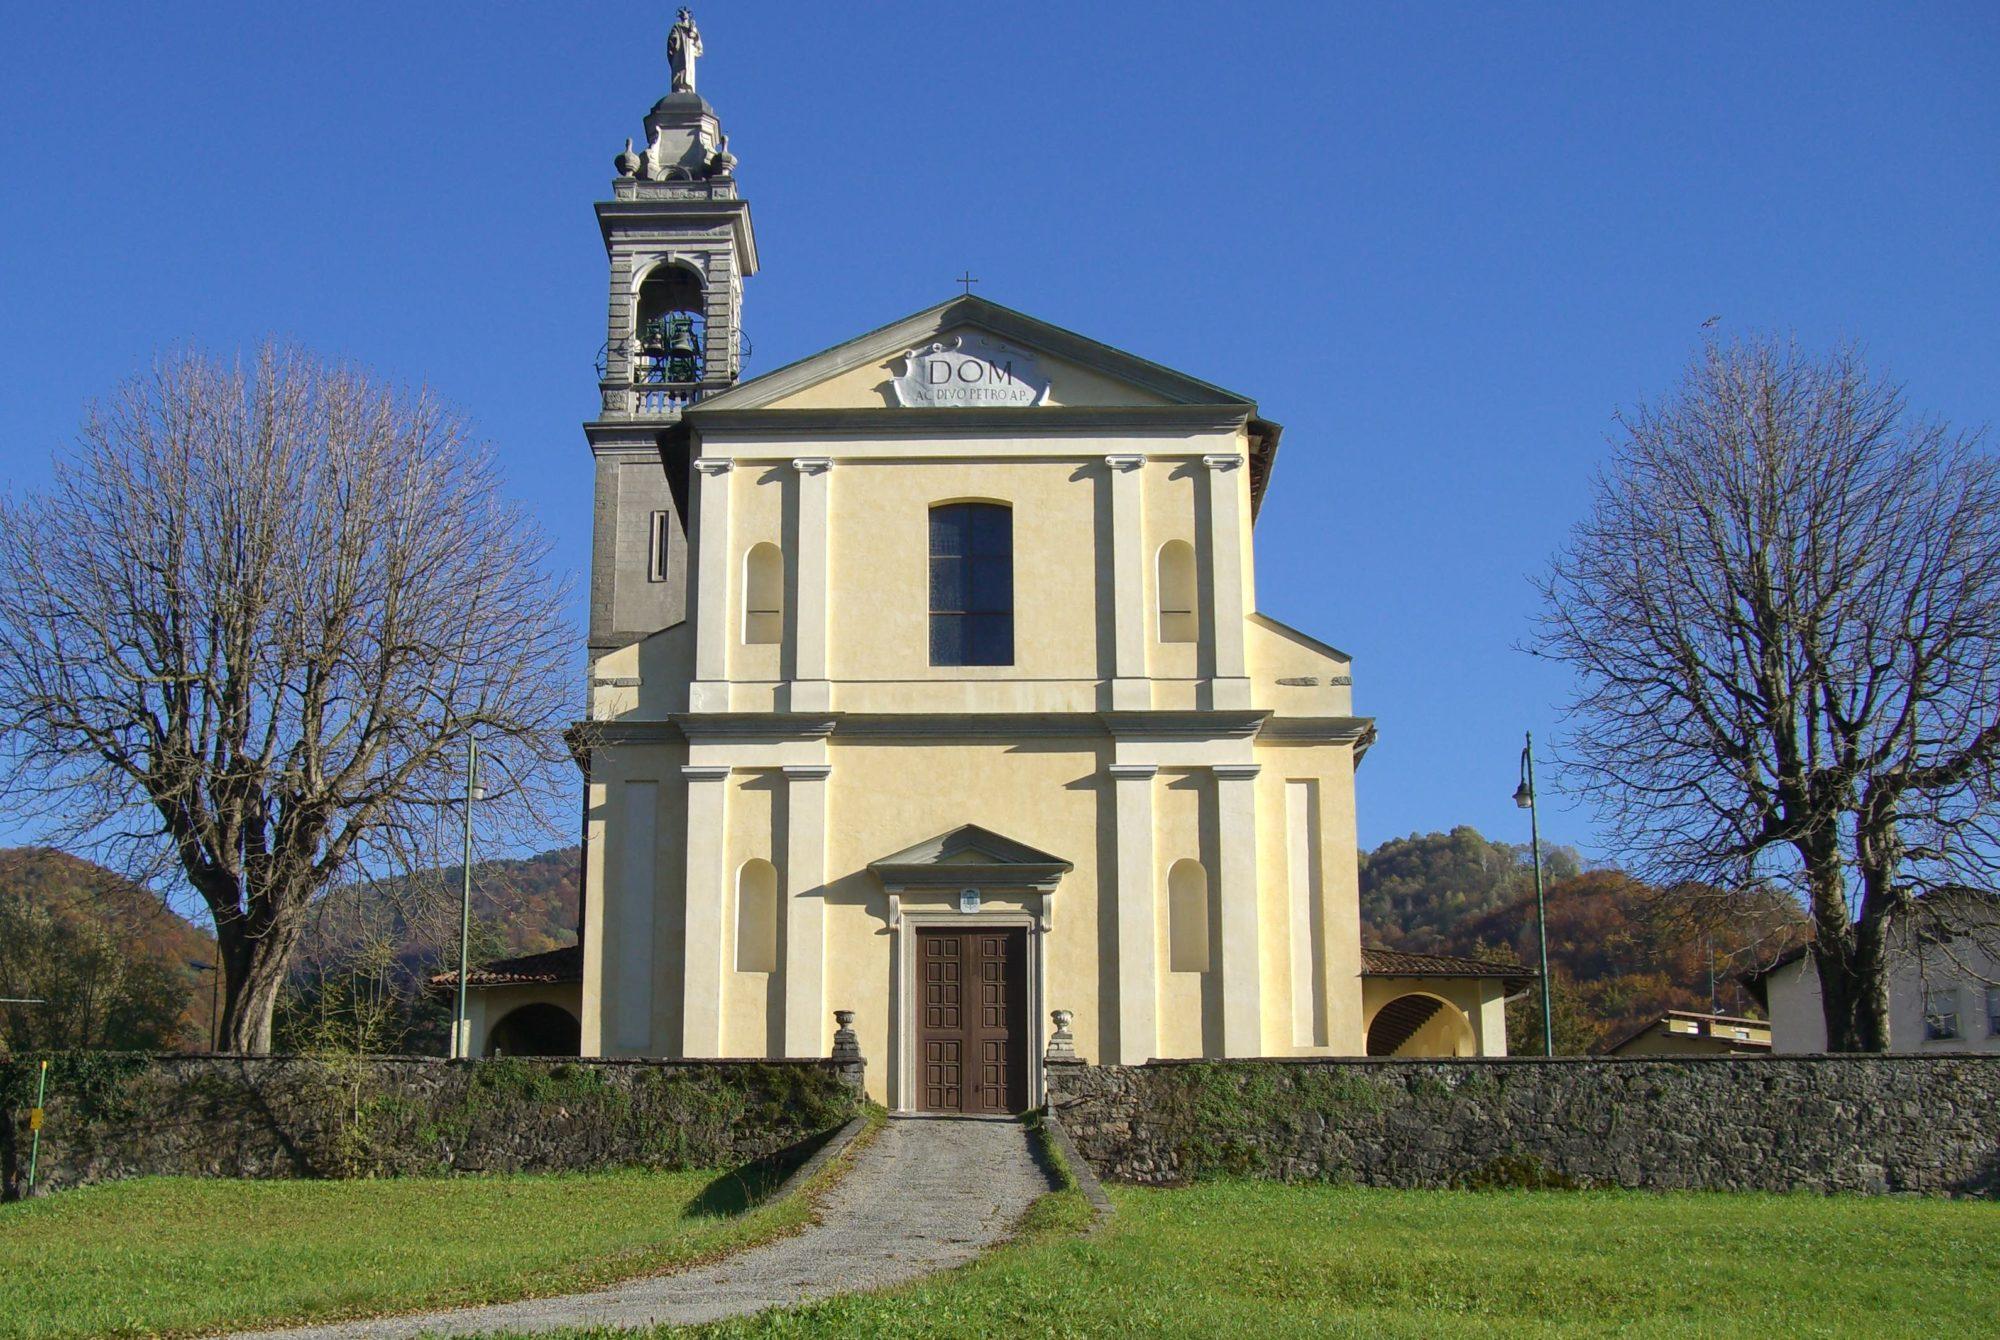 San Pietro d'Orzio